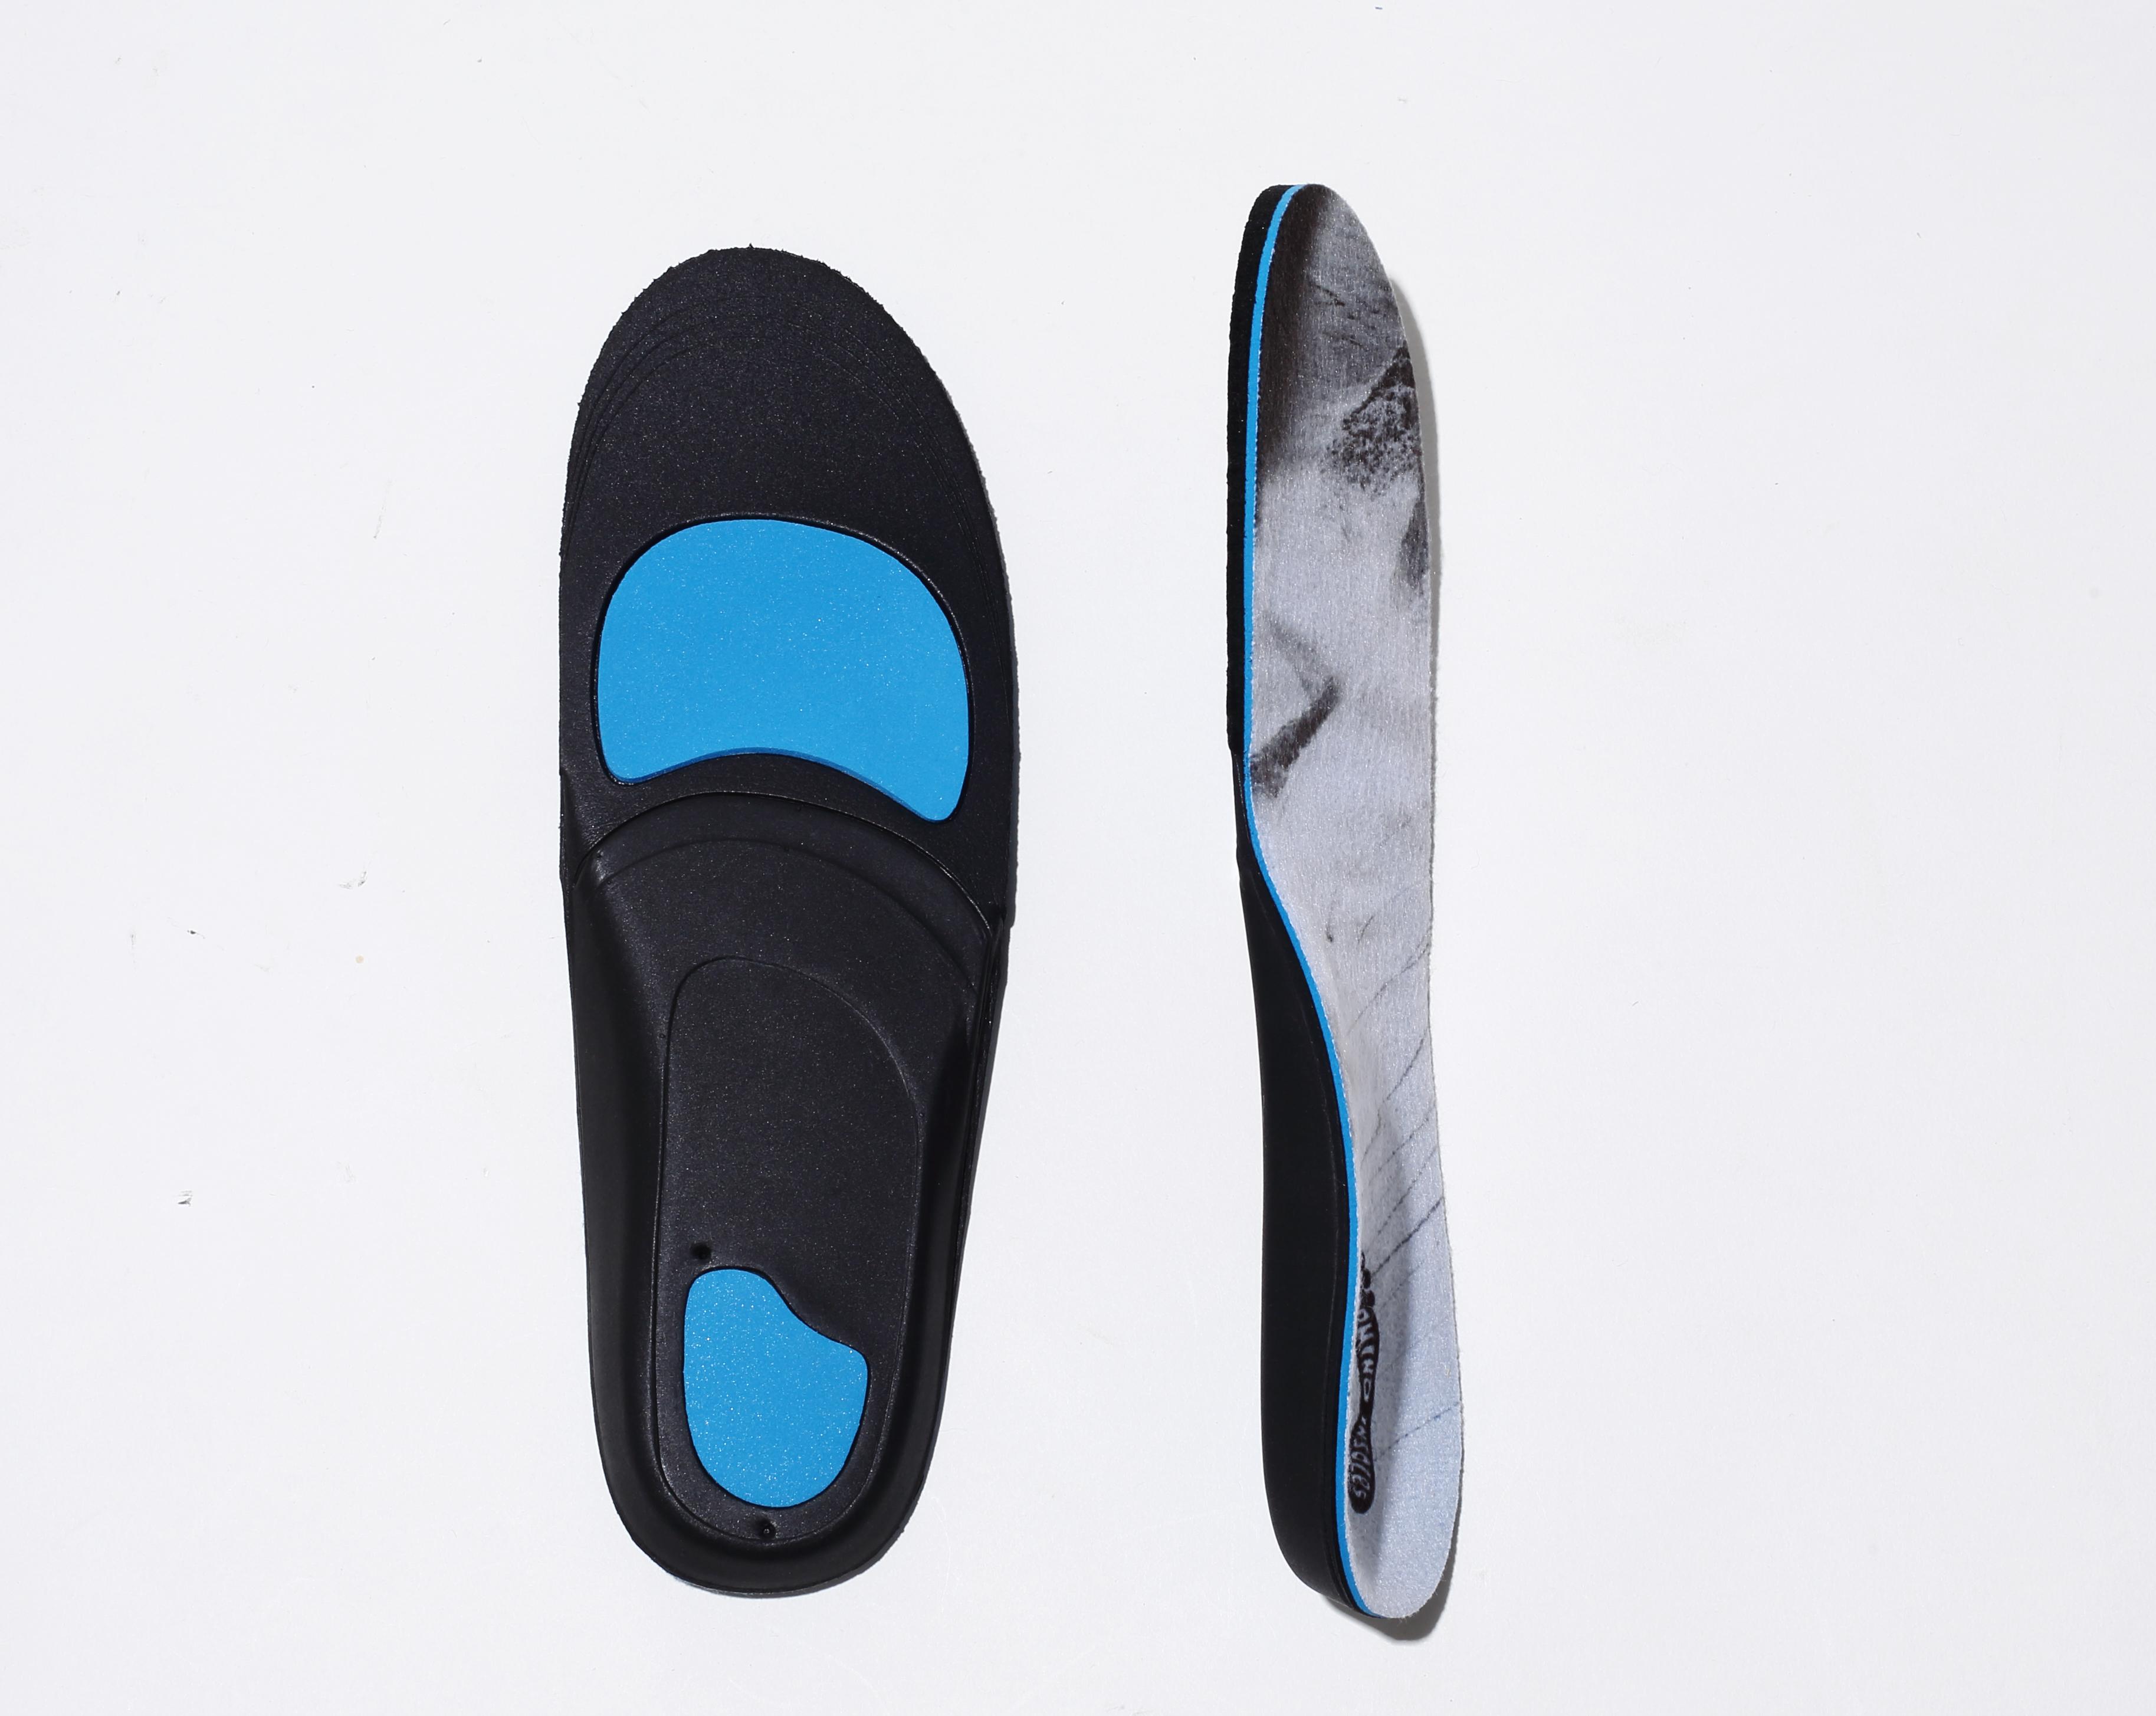 CUSHとDESTINでは衝撃が最も加わりやすい足指の付け根部分とかかとにブルーマジックを配置(写真はCUSH)。CUSHはスノーボーダー、スケーターと幅広くサポート。DESTINは最 薄モデルで足裏感覚を重要視するスケーターに人気だ